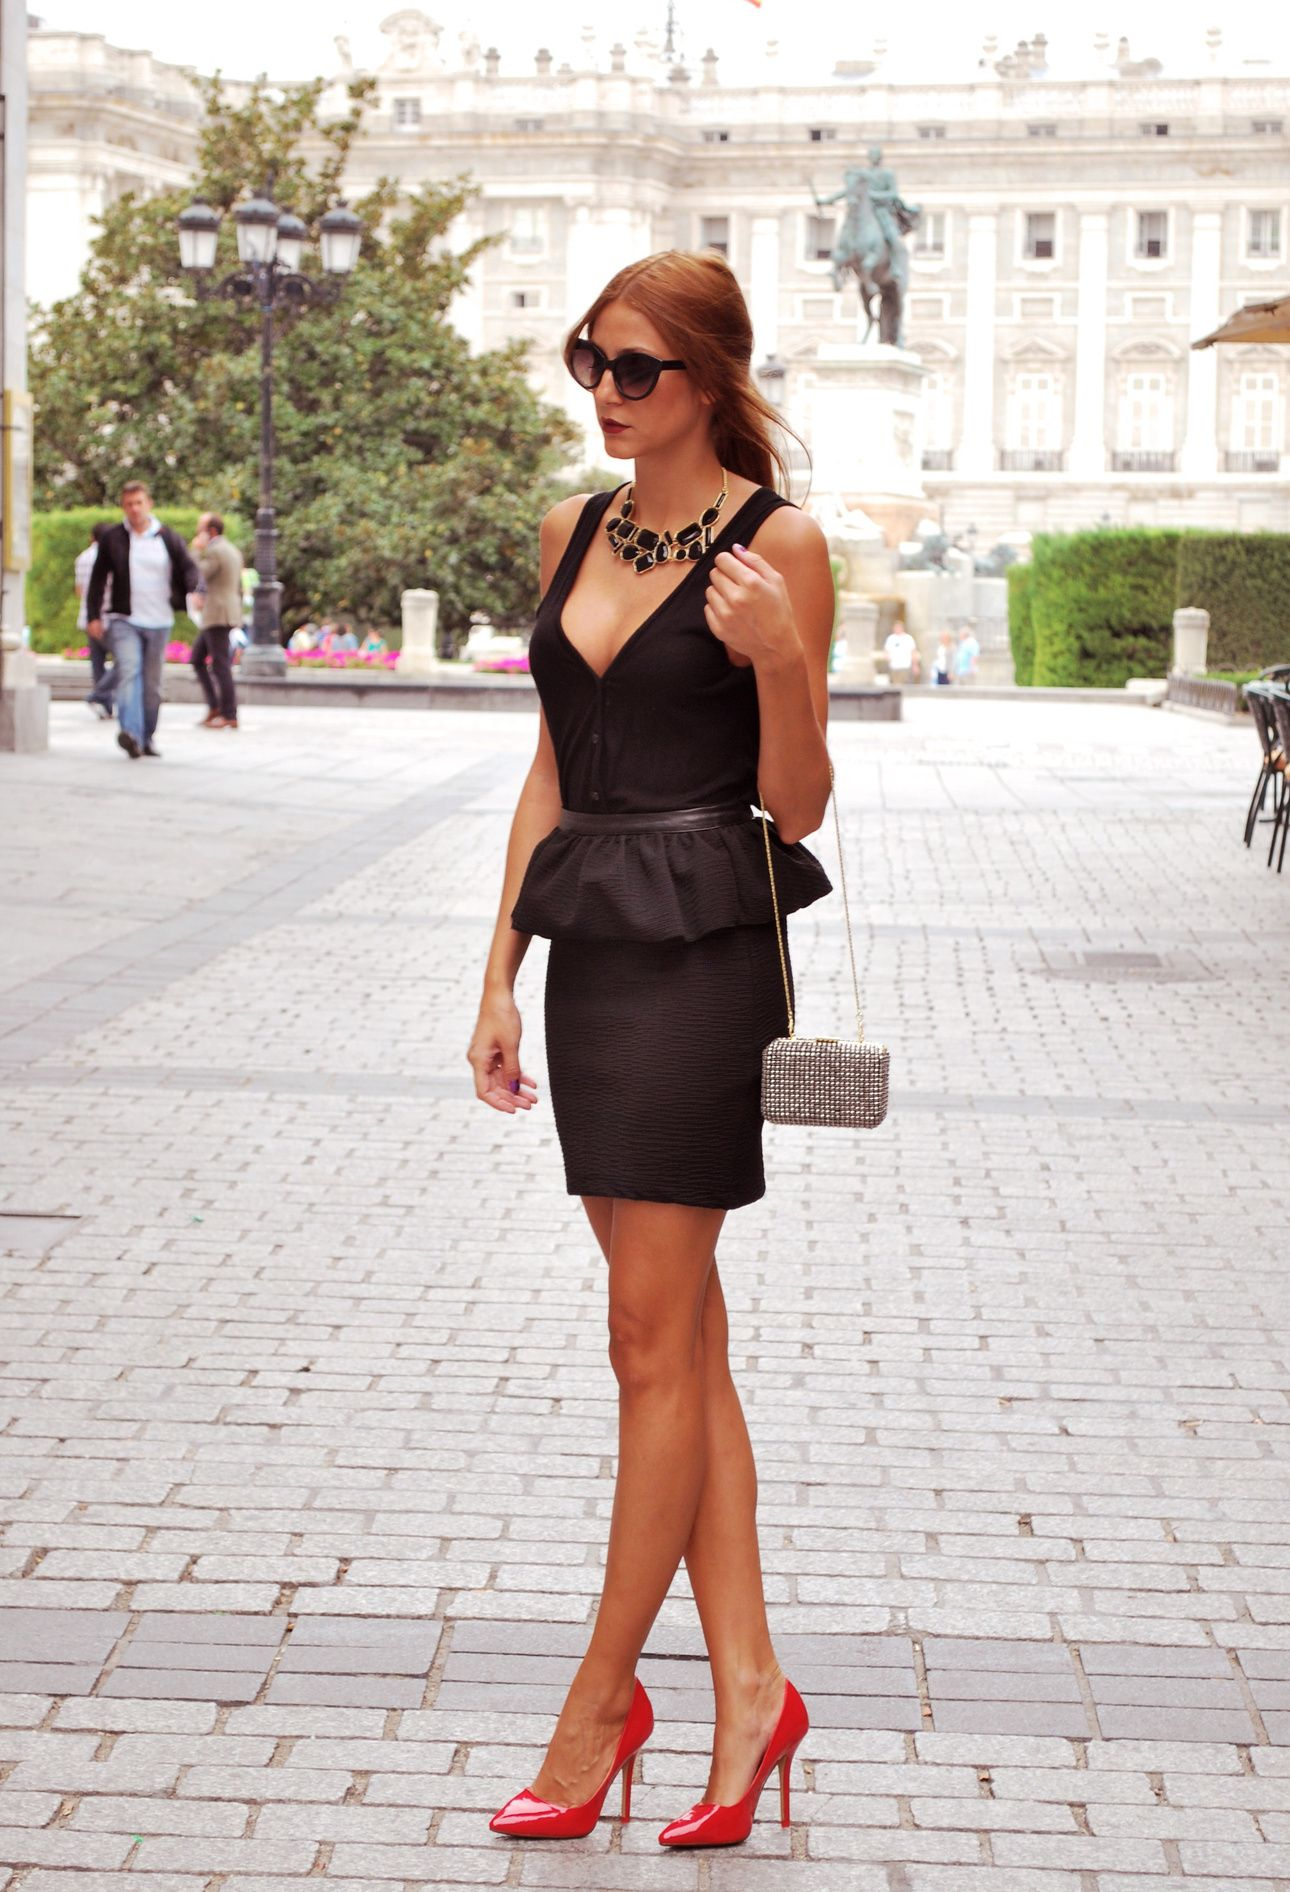 Black Peplum Peplum 2dayslook New Style Peplumdresses Www 2dayslook Com Fashion Top Fashion Bloggers Style [ 1892 x 1290 Pixel ]